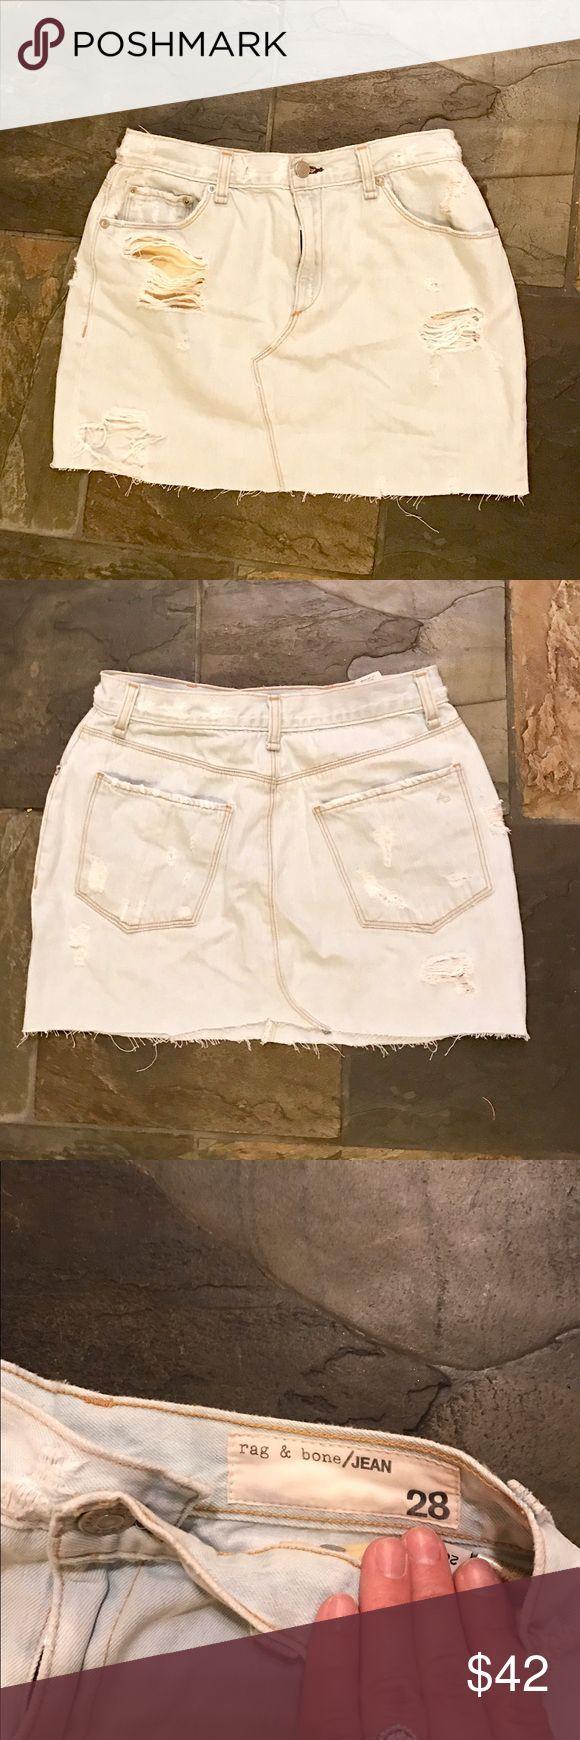 Rag & Bone distressed Jean Skirt Light wash rag & bone skirt. Distressed in all the right places. 👌🏼 rag & bone Skirts Mini